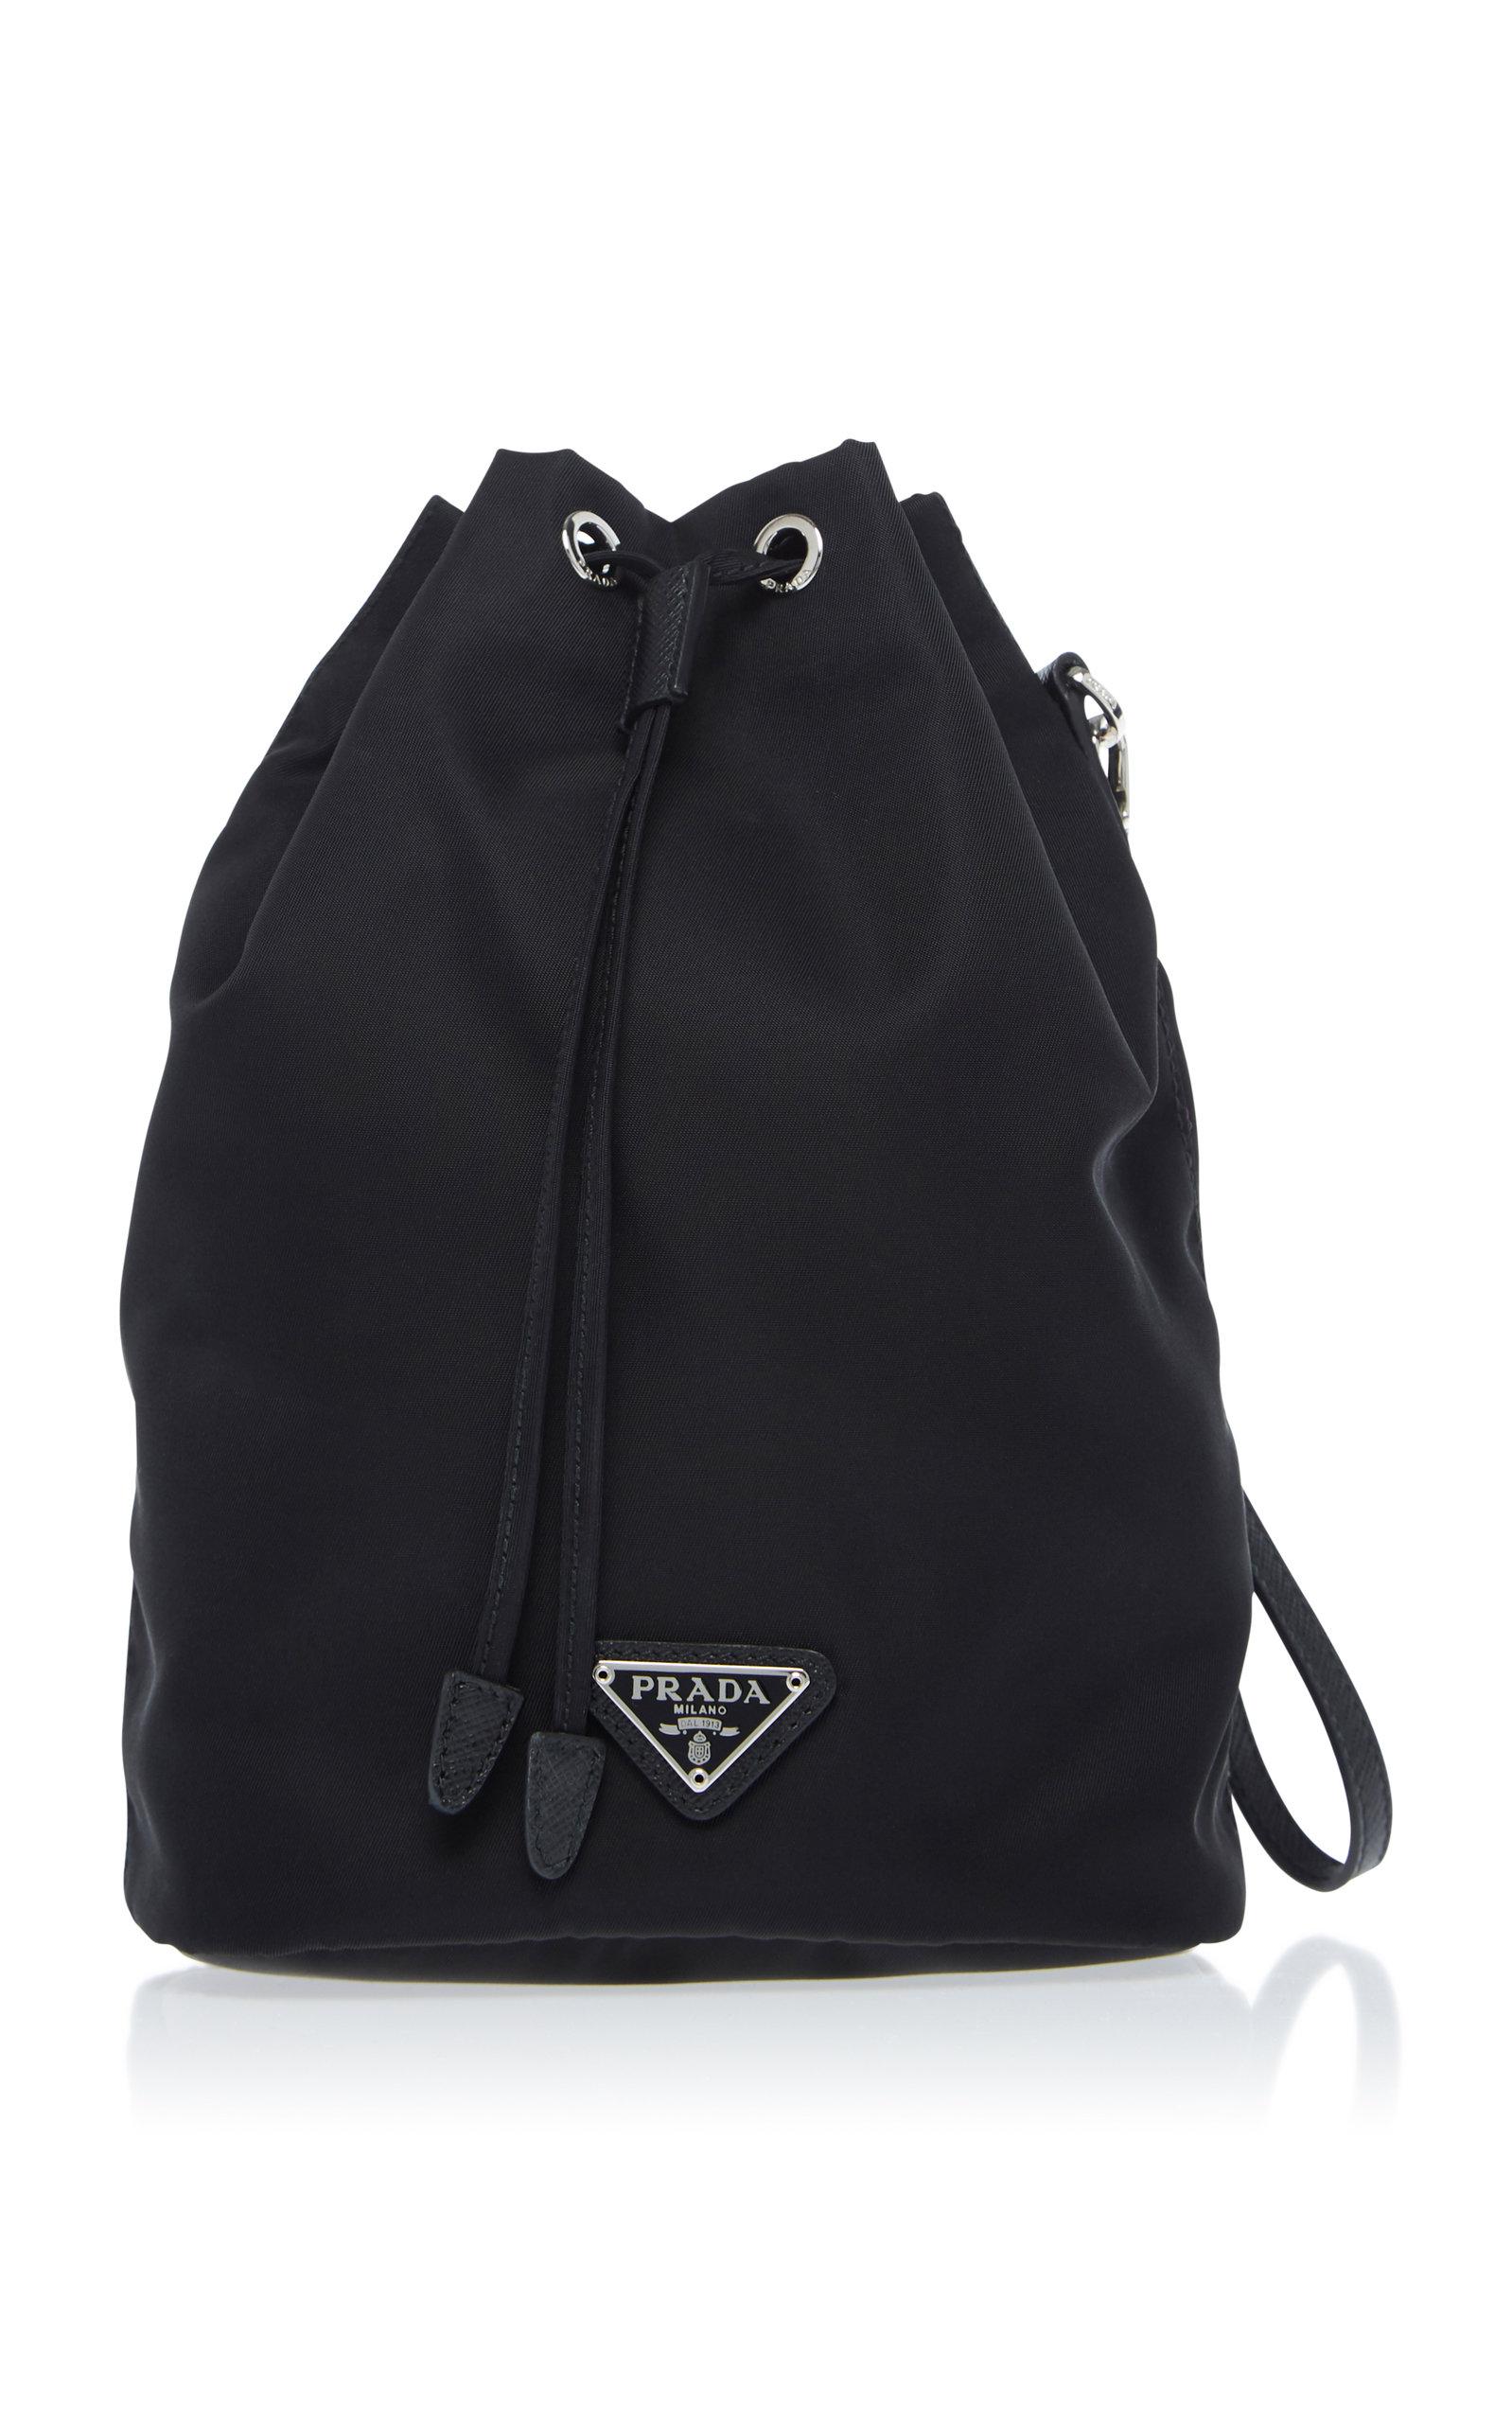 55a56670eb76 italy prada women backpacks vestiaire collective 36de7 21f52; official prada  nylon drawstring backpack 116bd 2d523